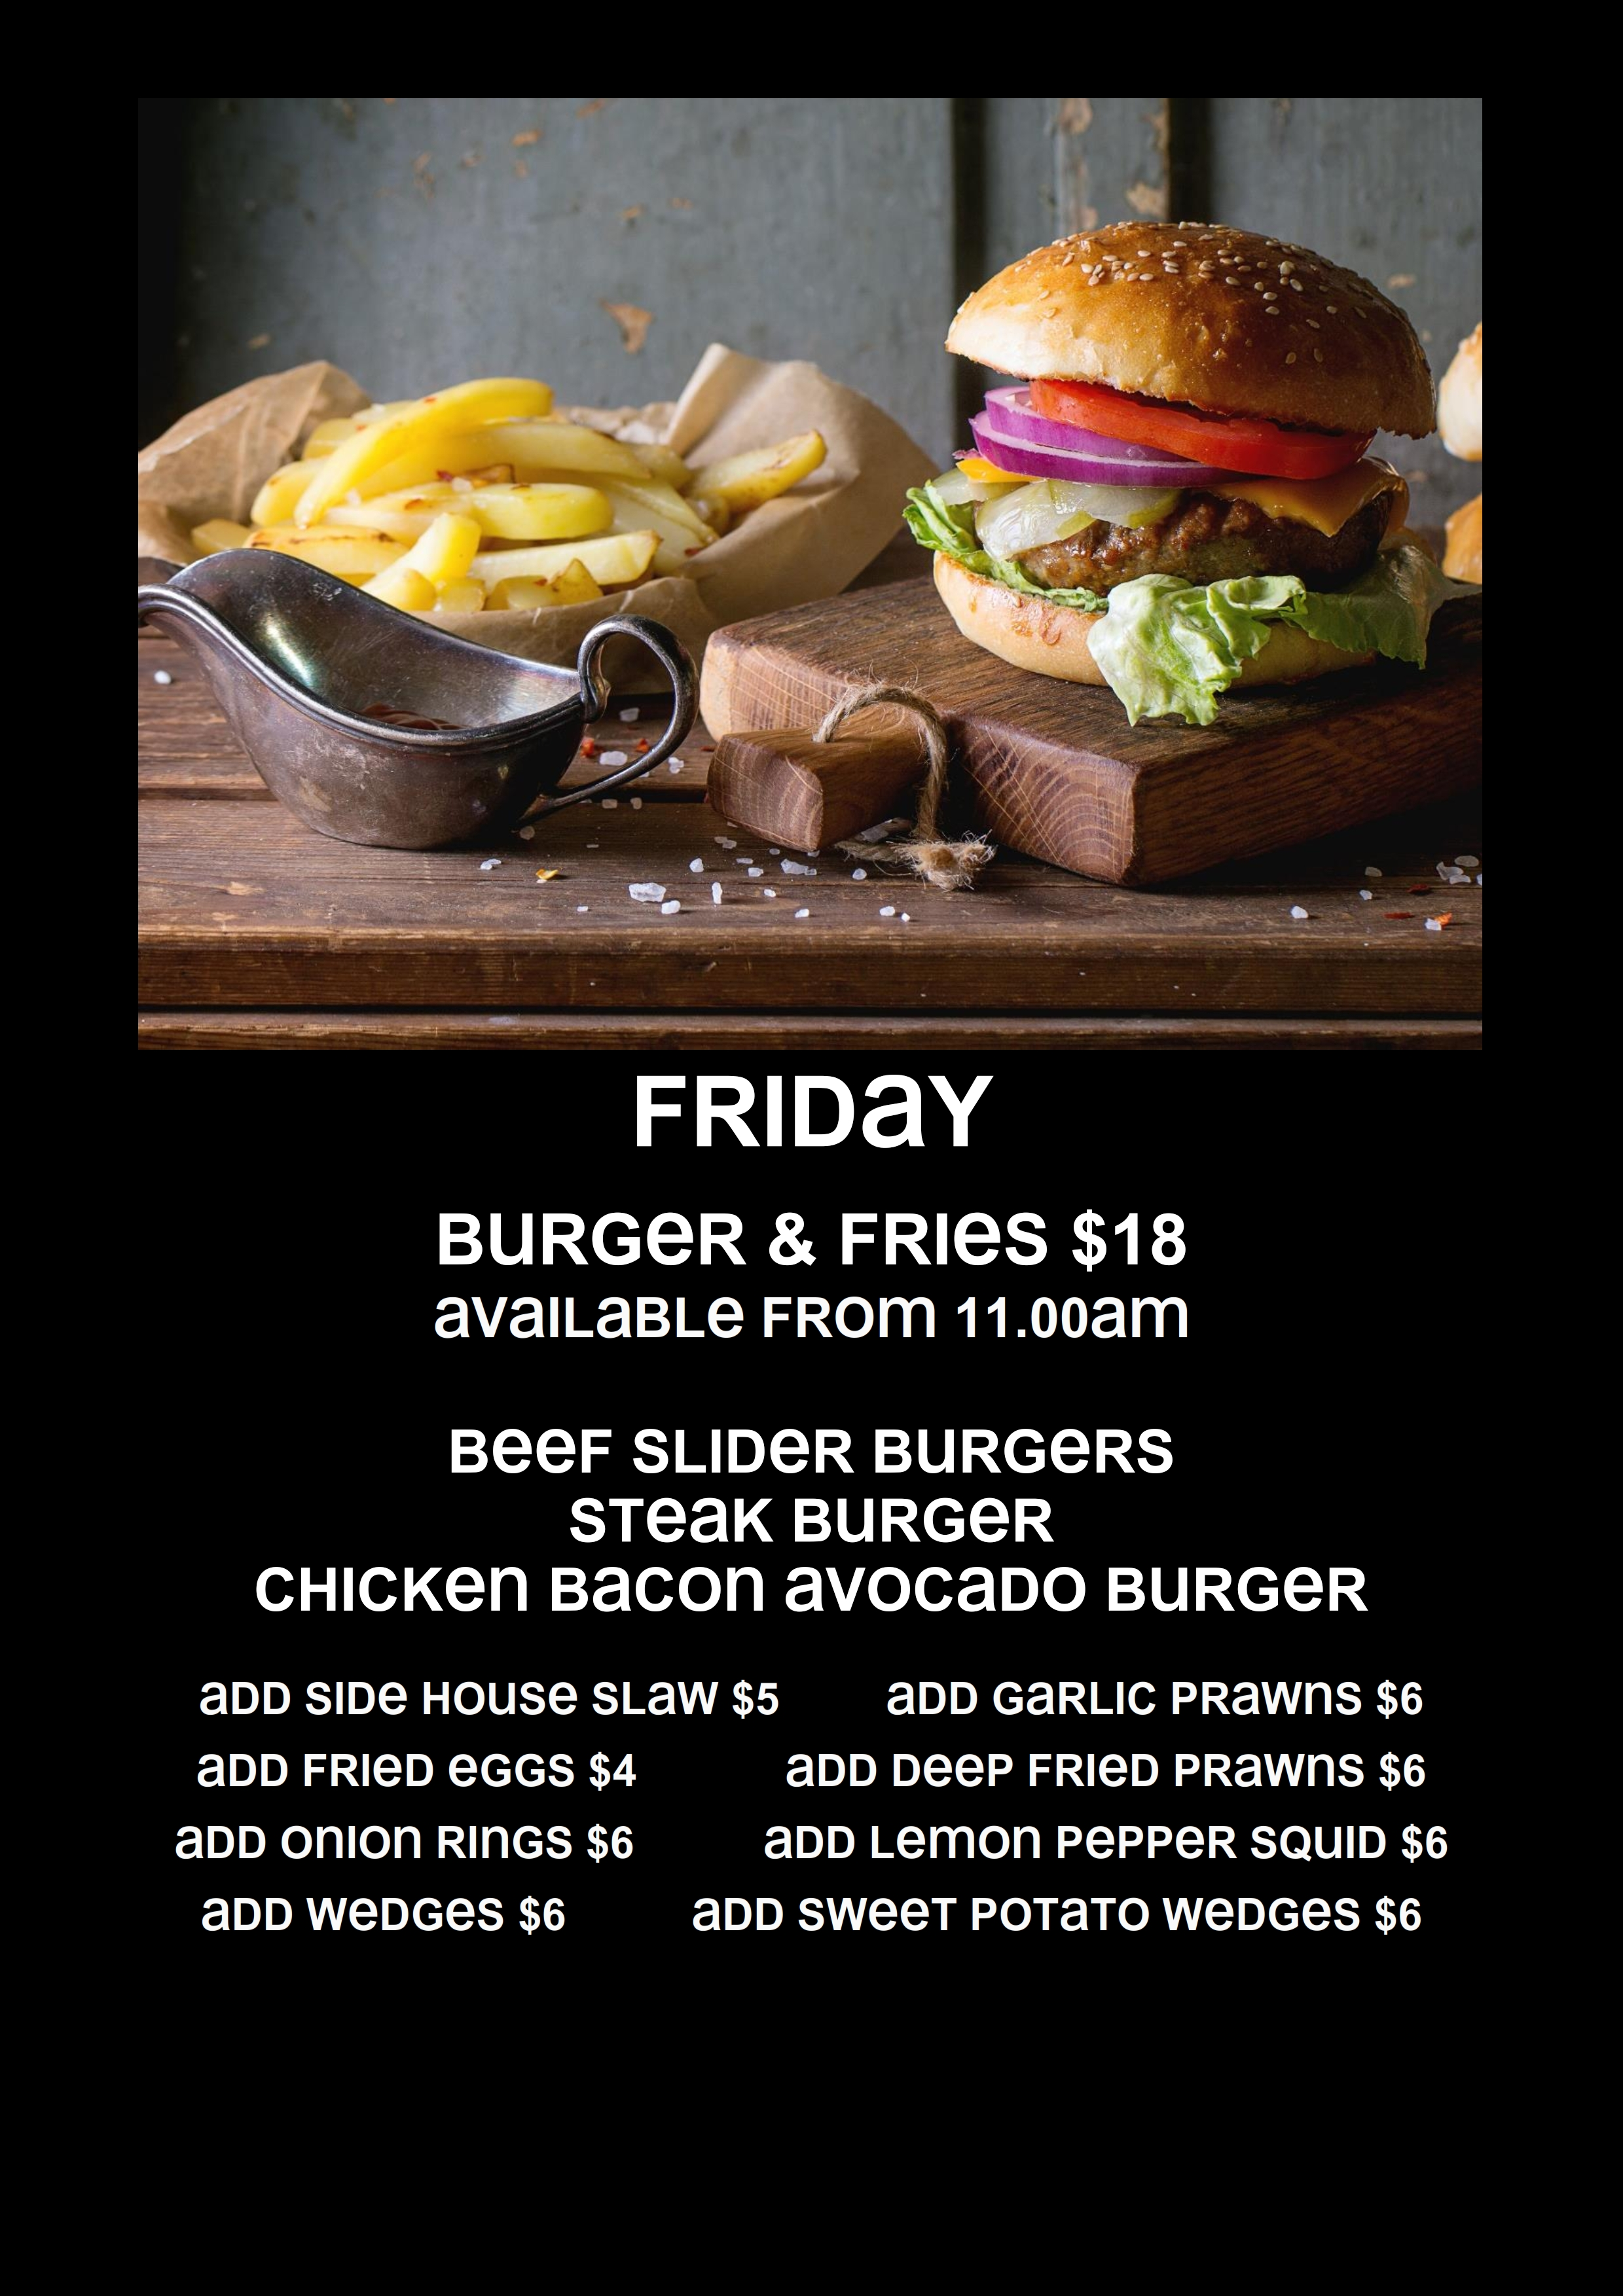 Friday Burgers